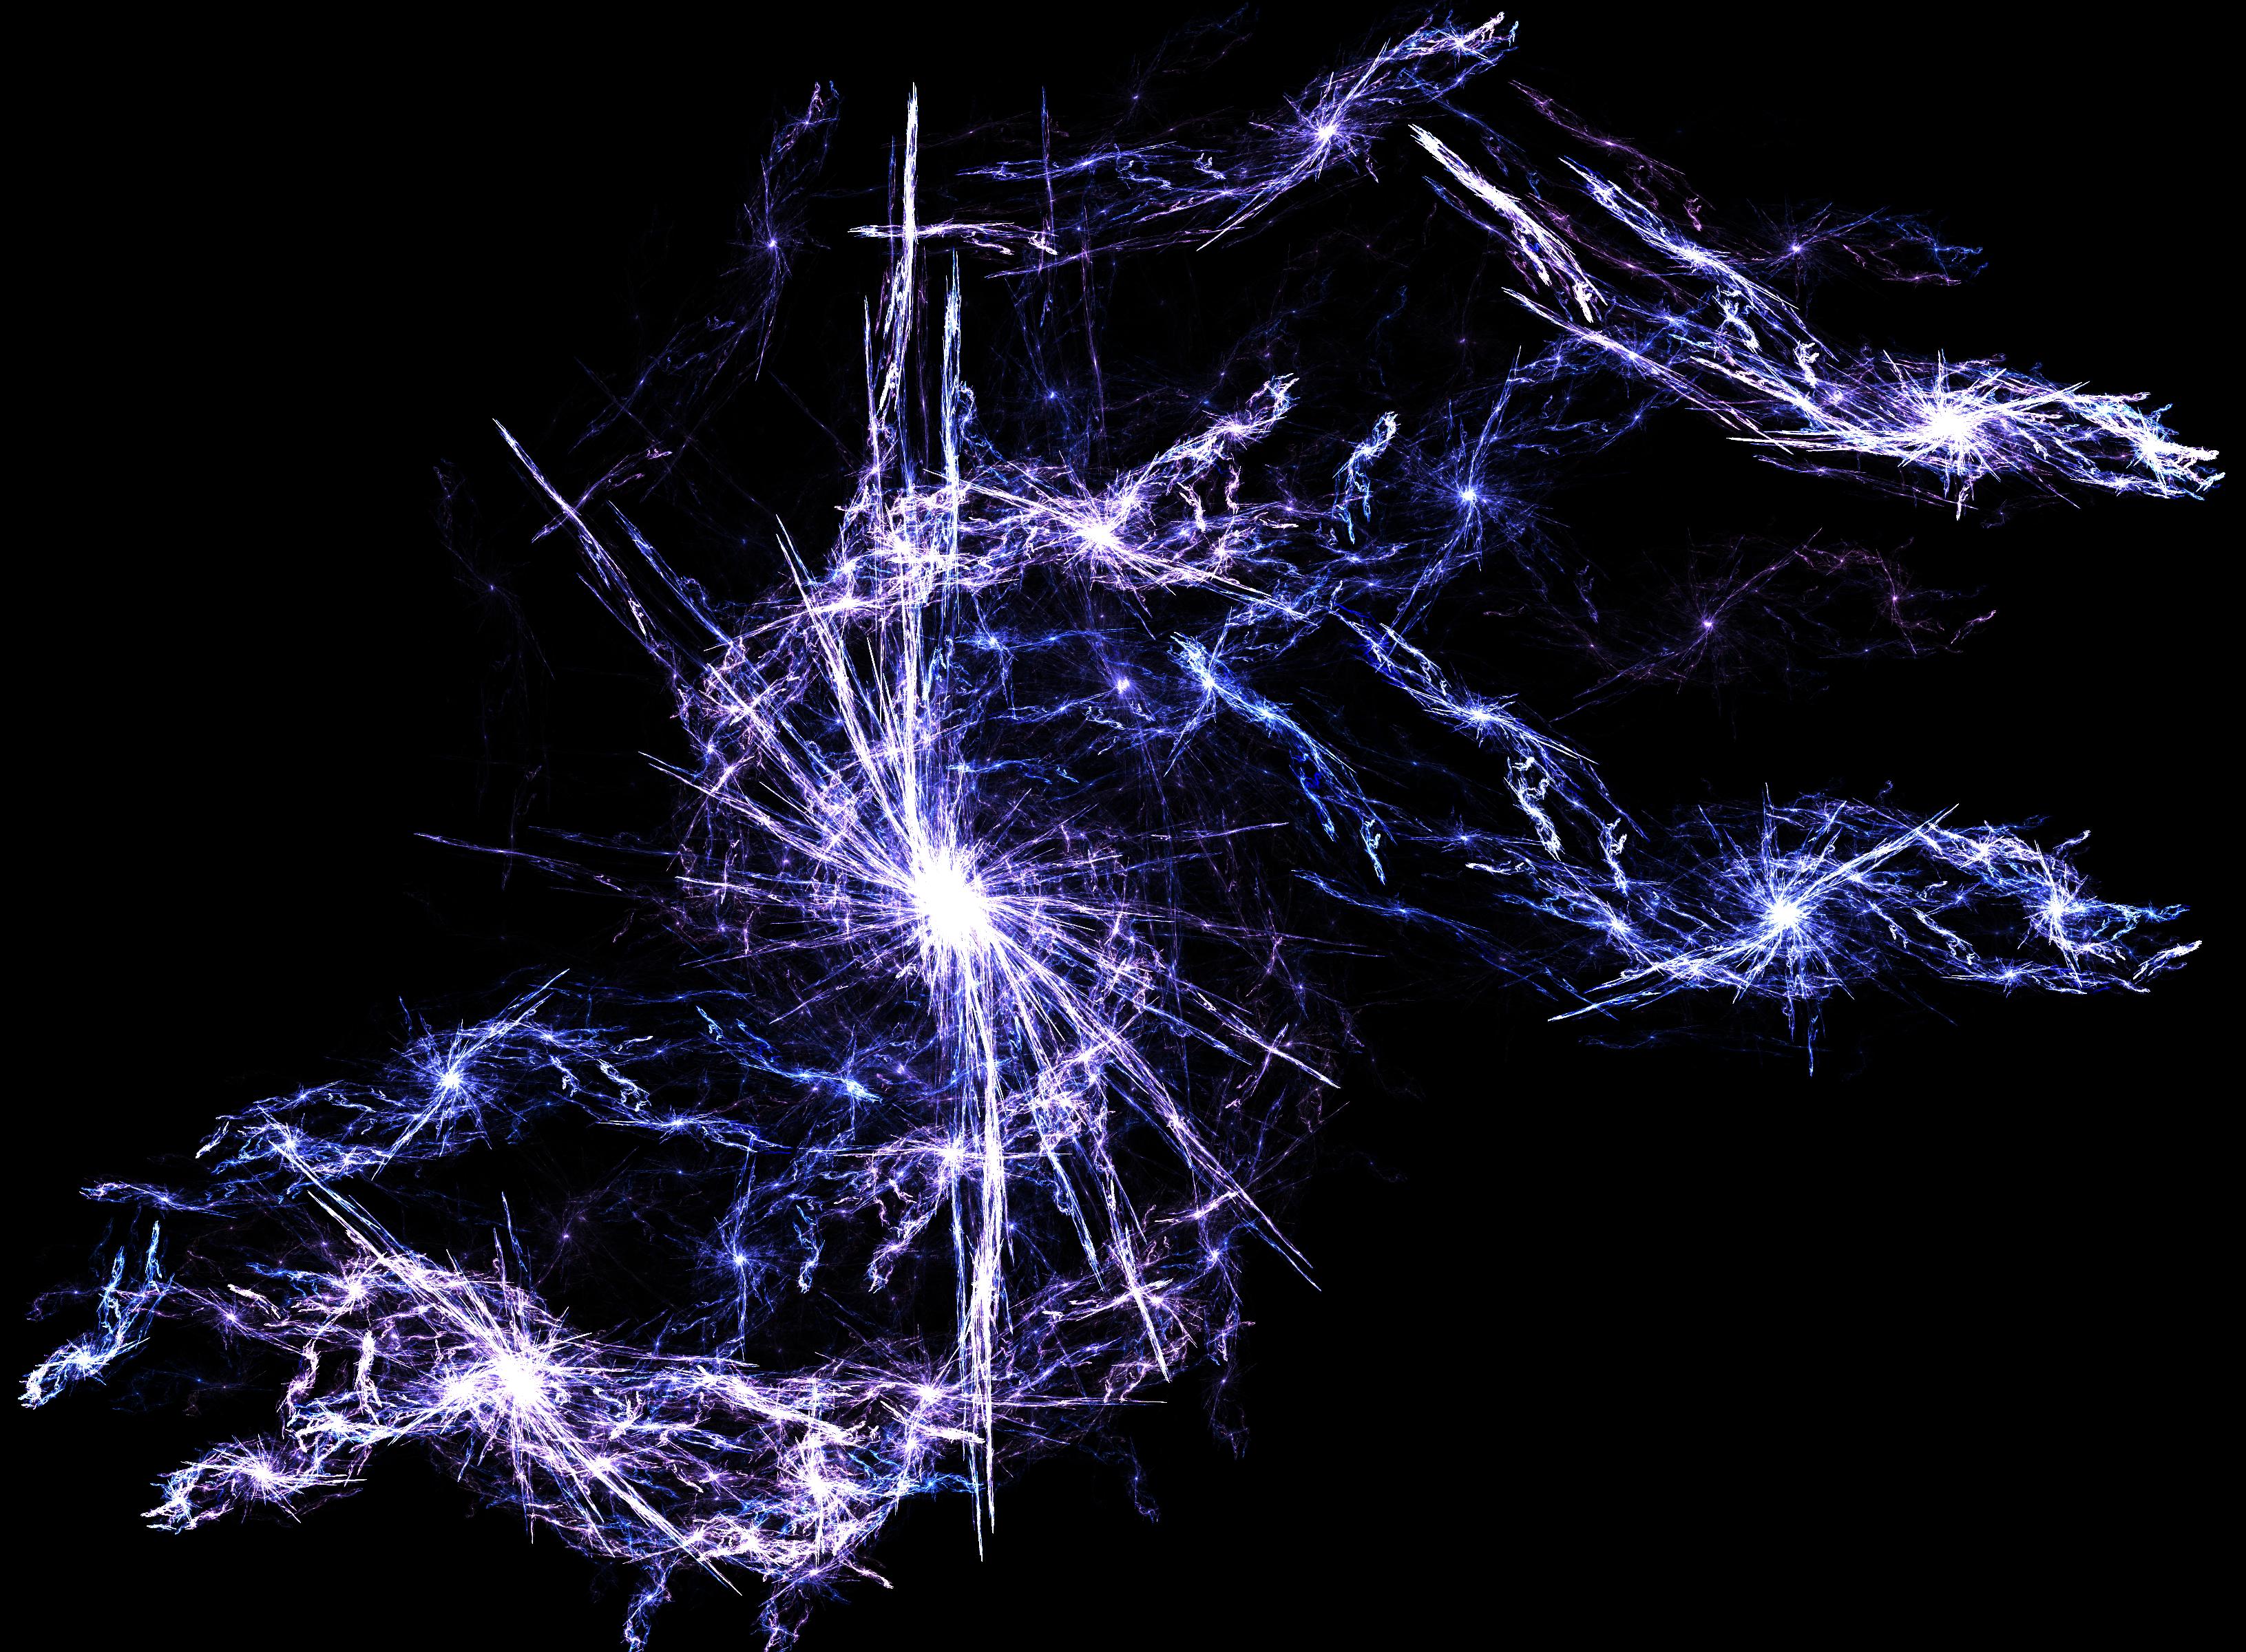 lightning art wallpaper - photo #9